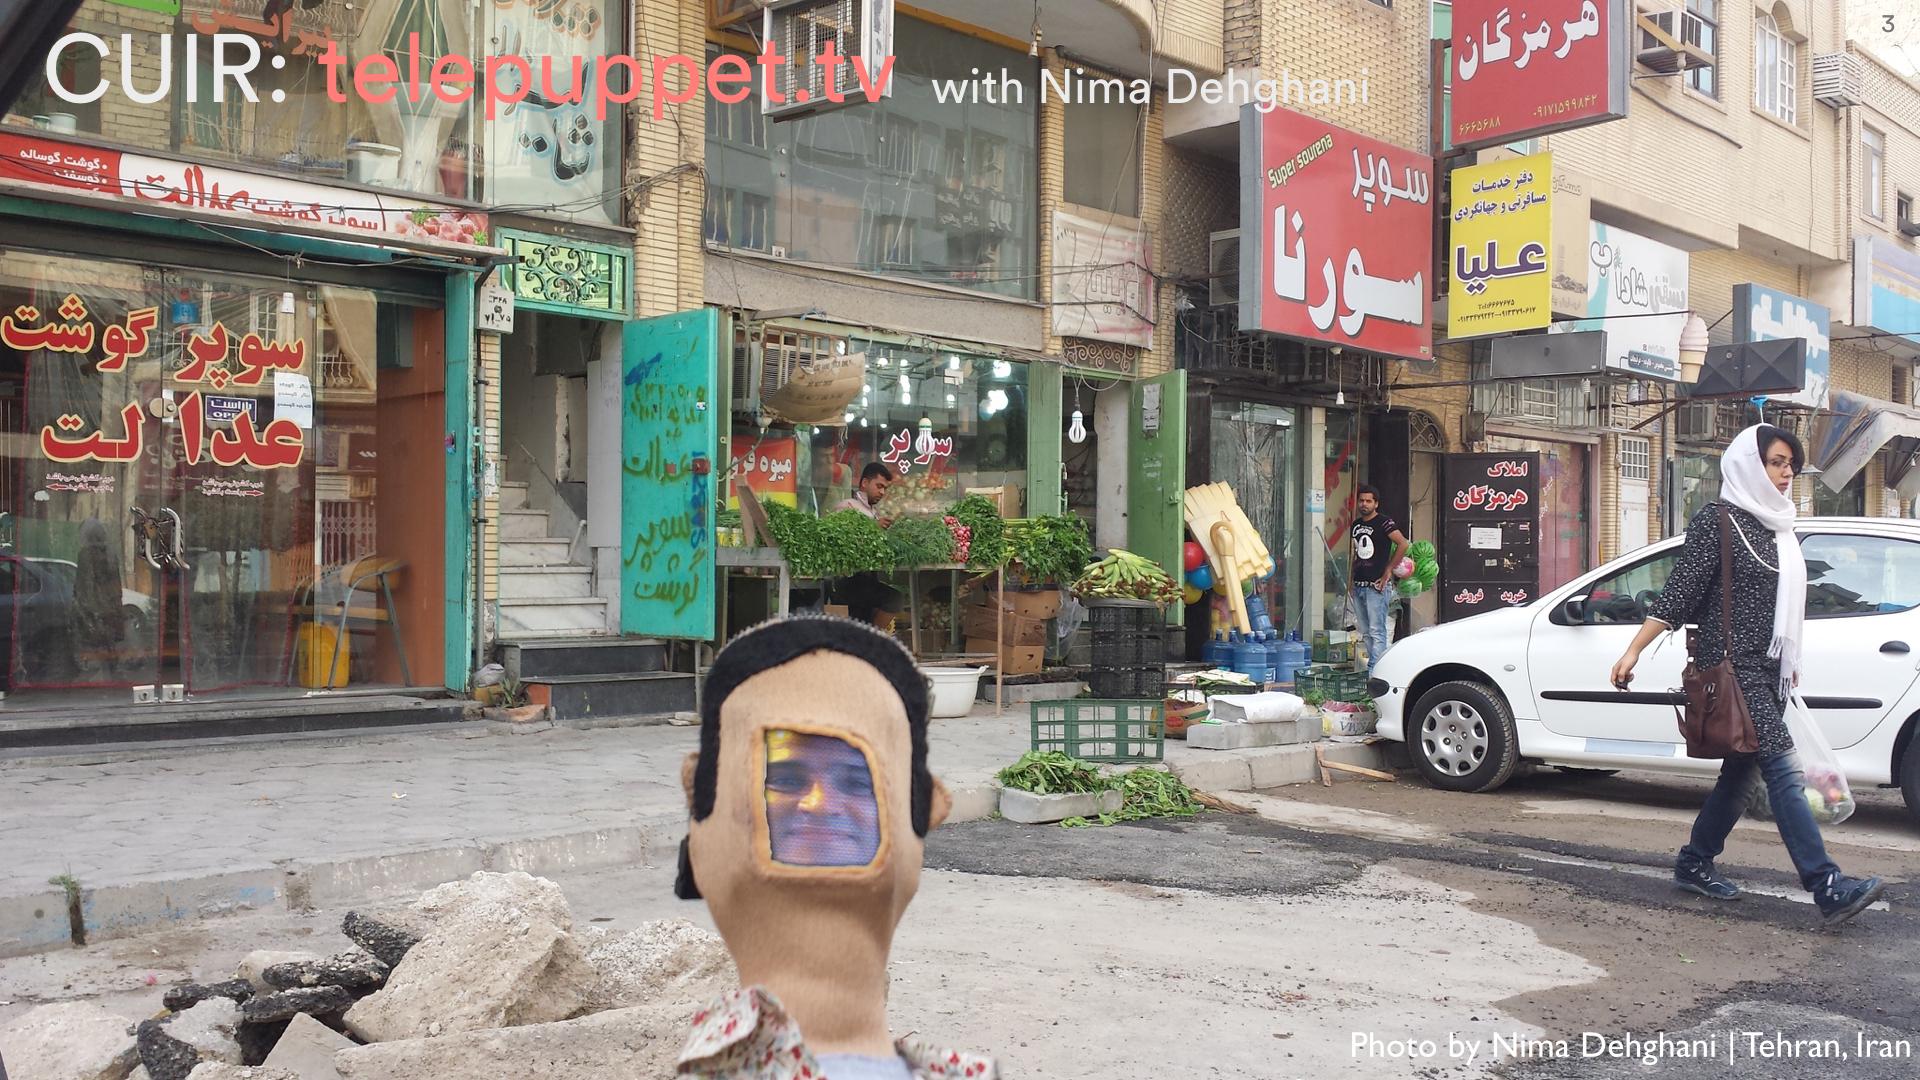 Telepuppet visits our friend's favorite shop